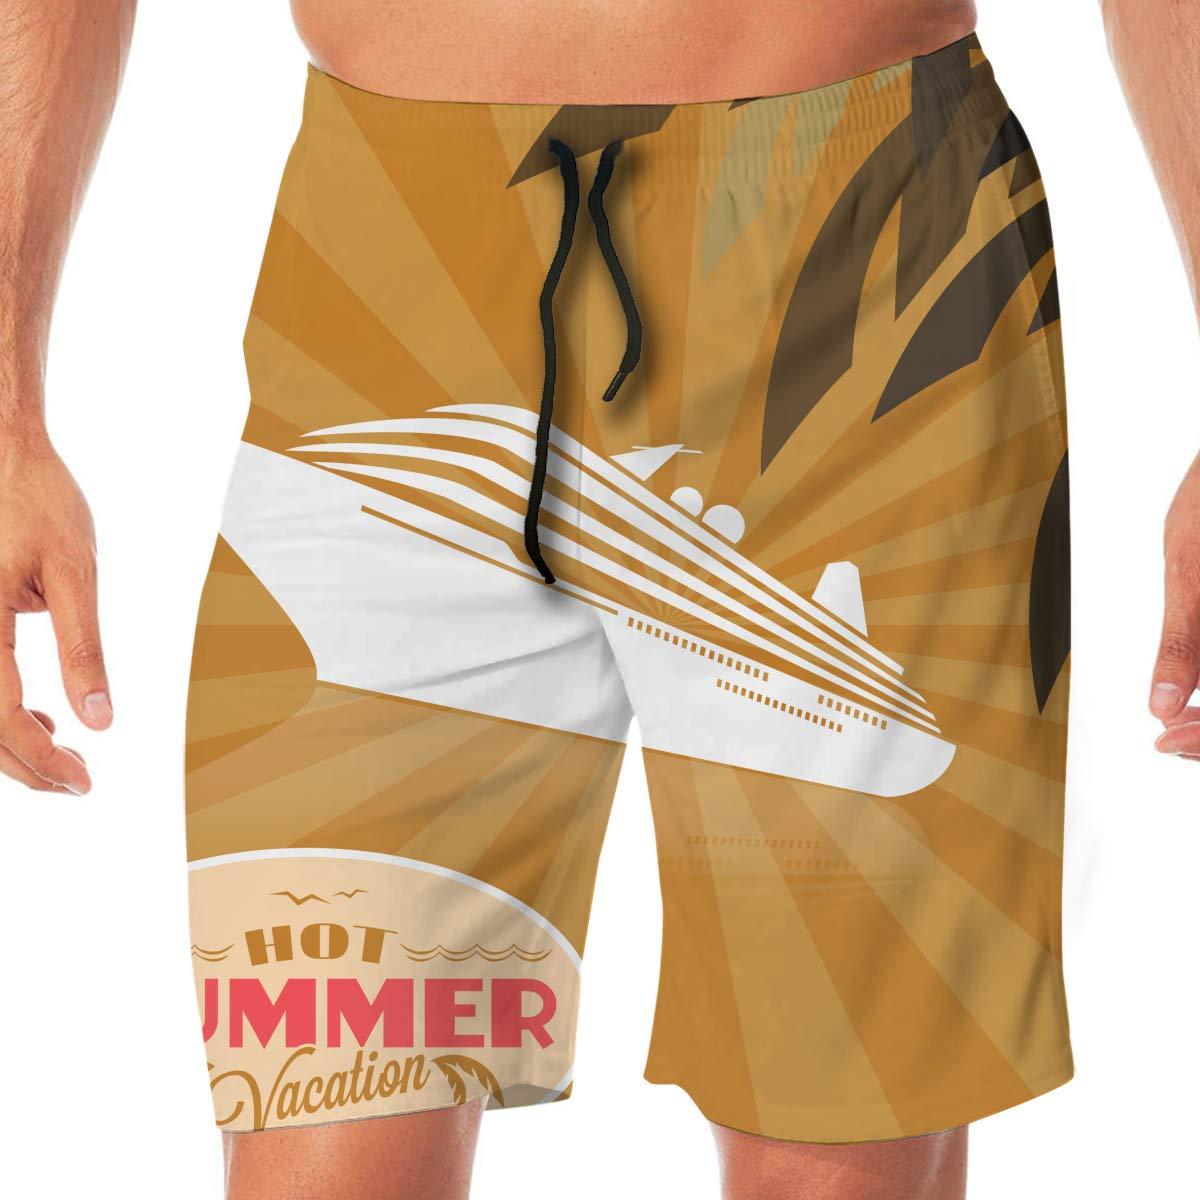 Amayc Mens Briefs Beach Pants Trunks Summer Vacation Orange Swimming Board Shorts